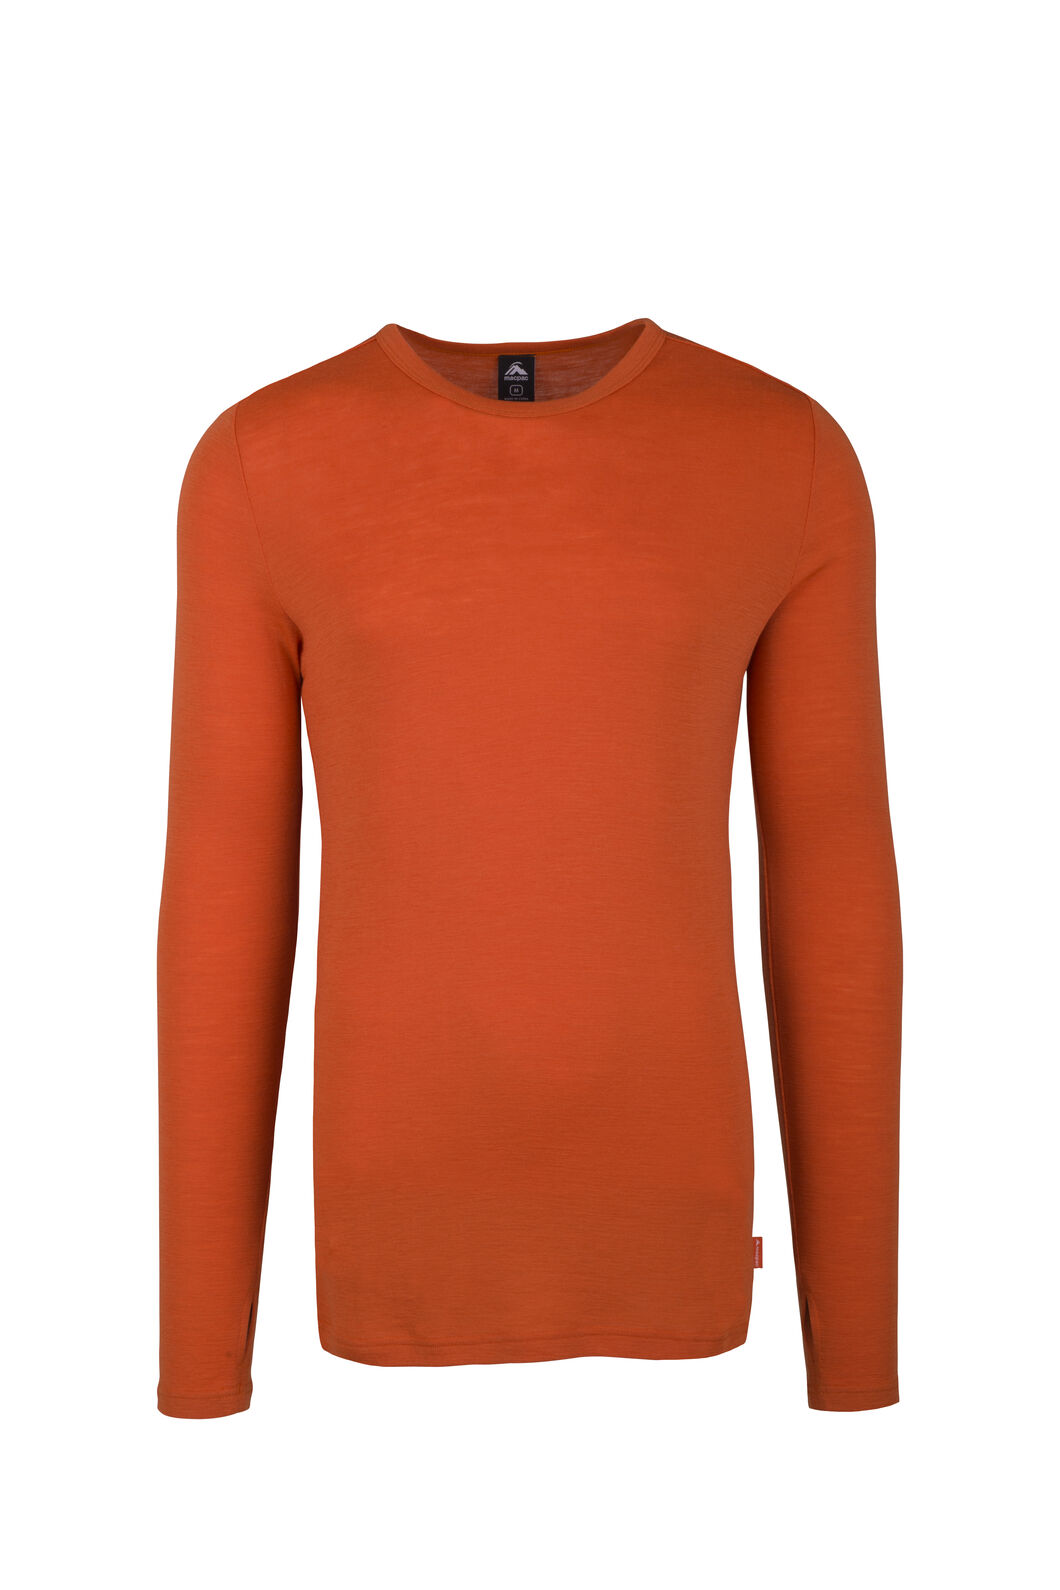 Macpac 220 Merino Long Sleeve Top — Men's, Burnt Orange, hi-res